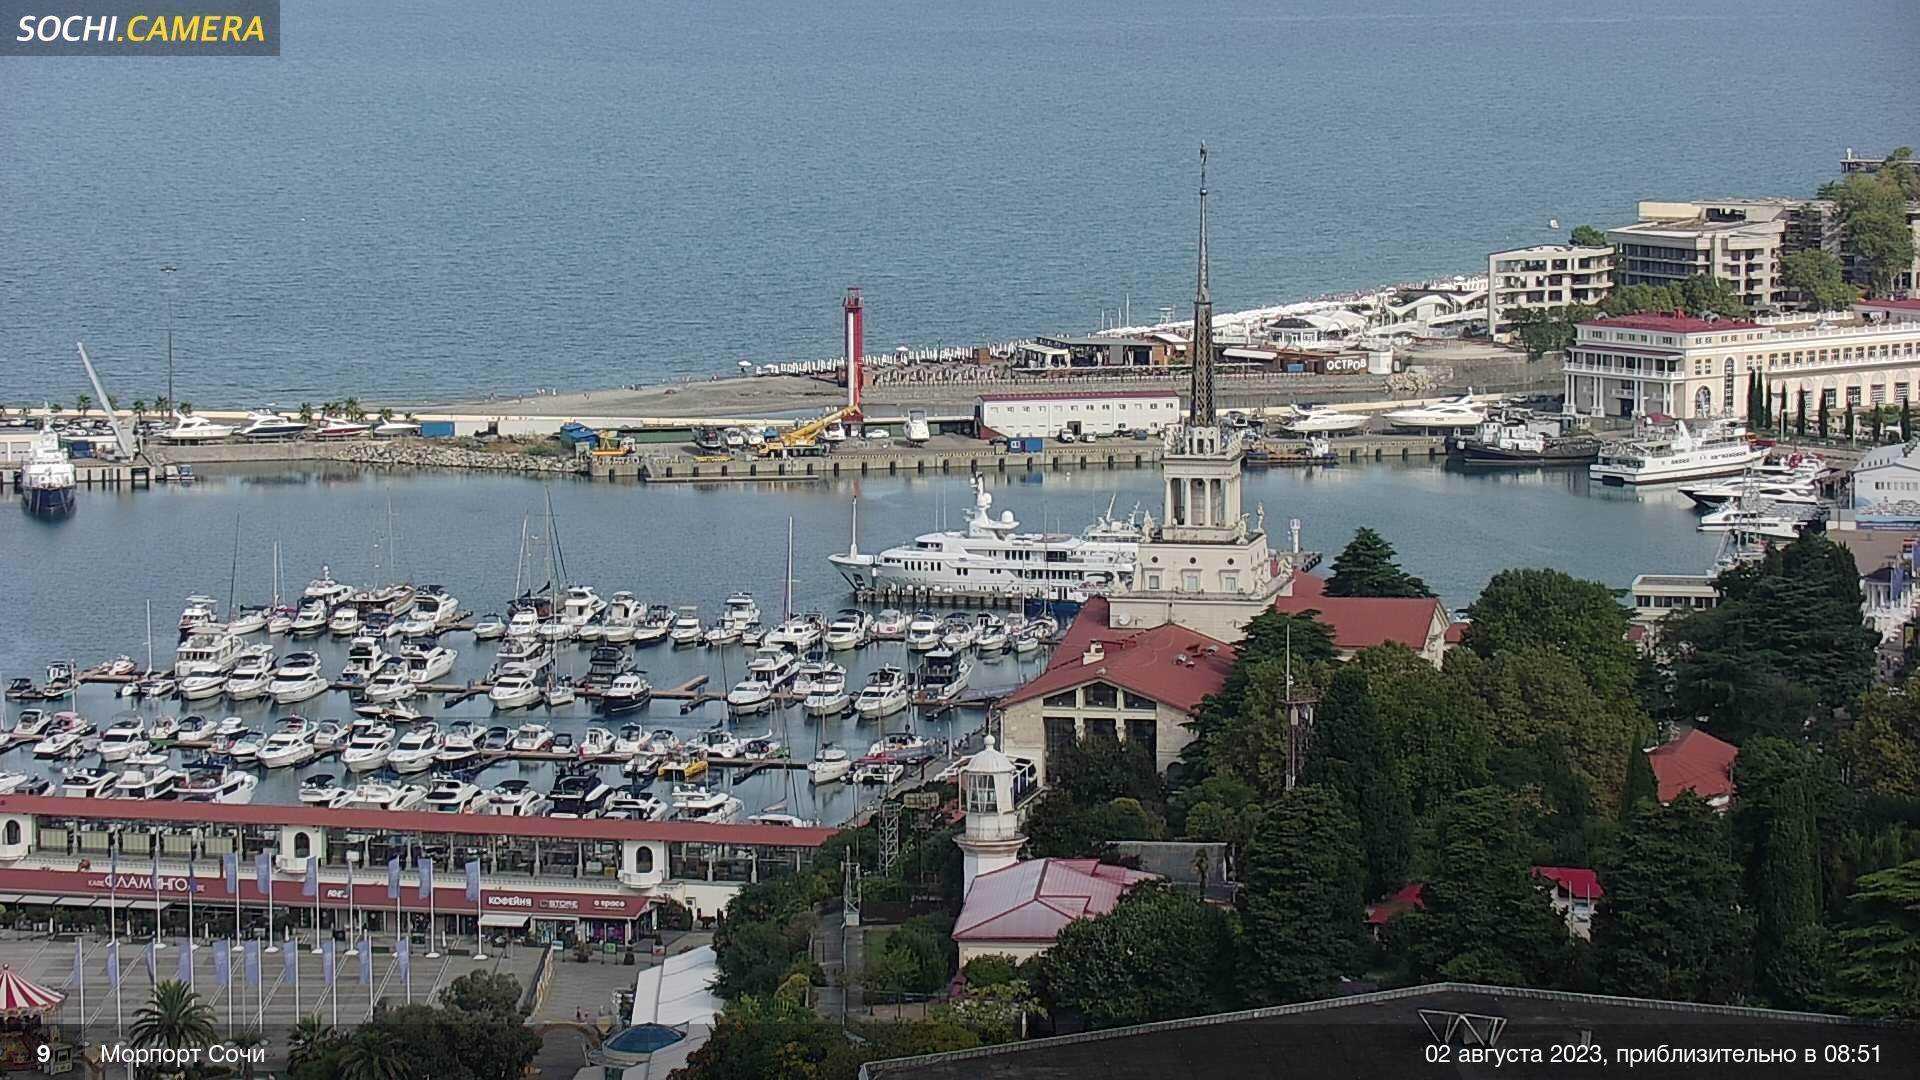 Webkamera Соболевка: Морпорт Сочи